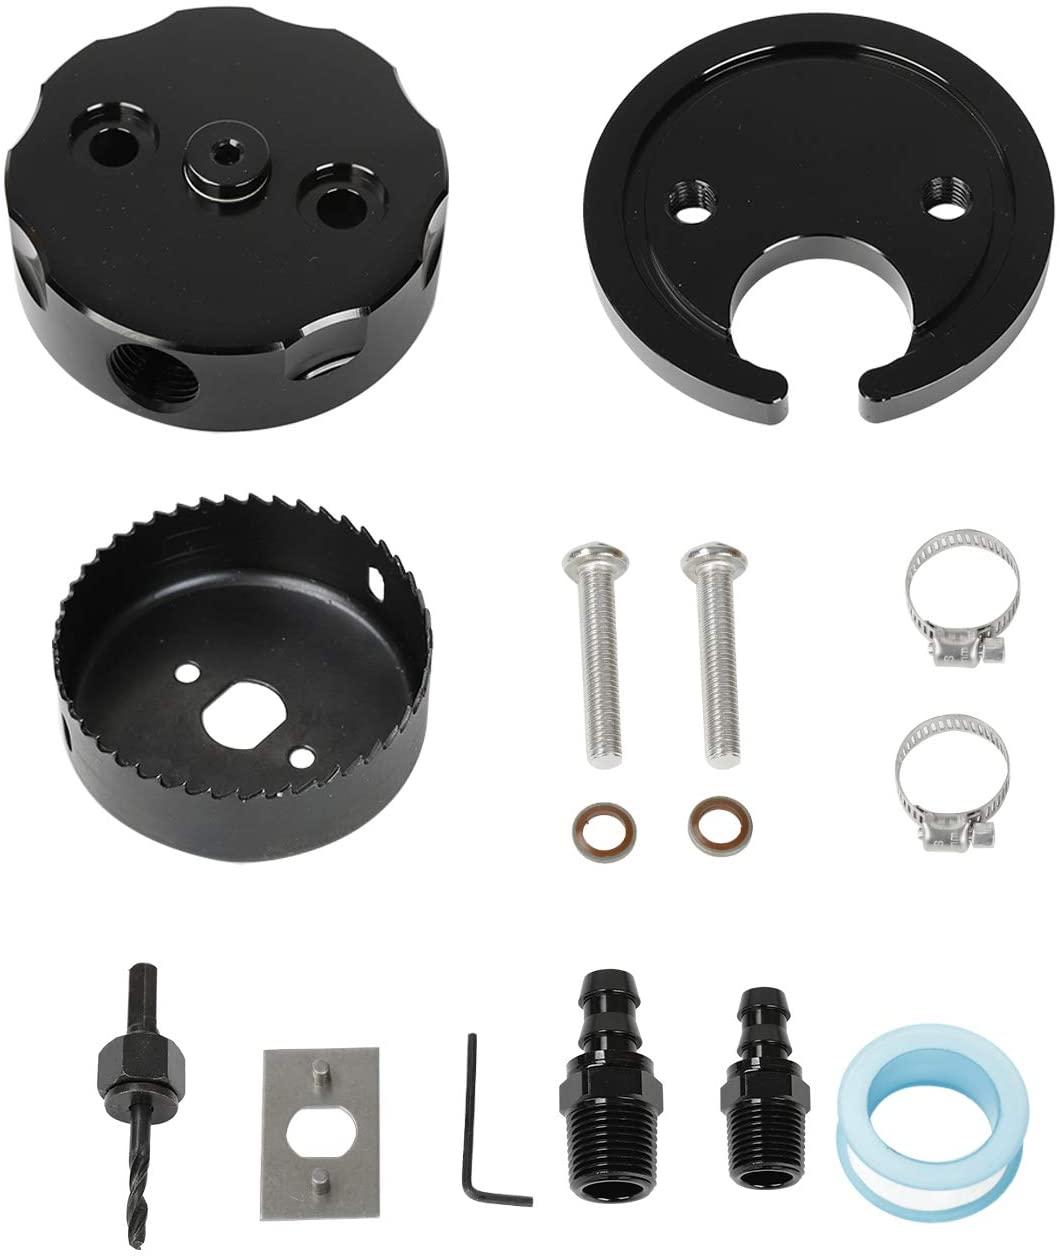 SUPERFASTRACING Diesel Parts Fuel Tank Gas/Diesel Sump for FASS AirDog Fuelab Black